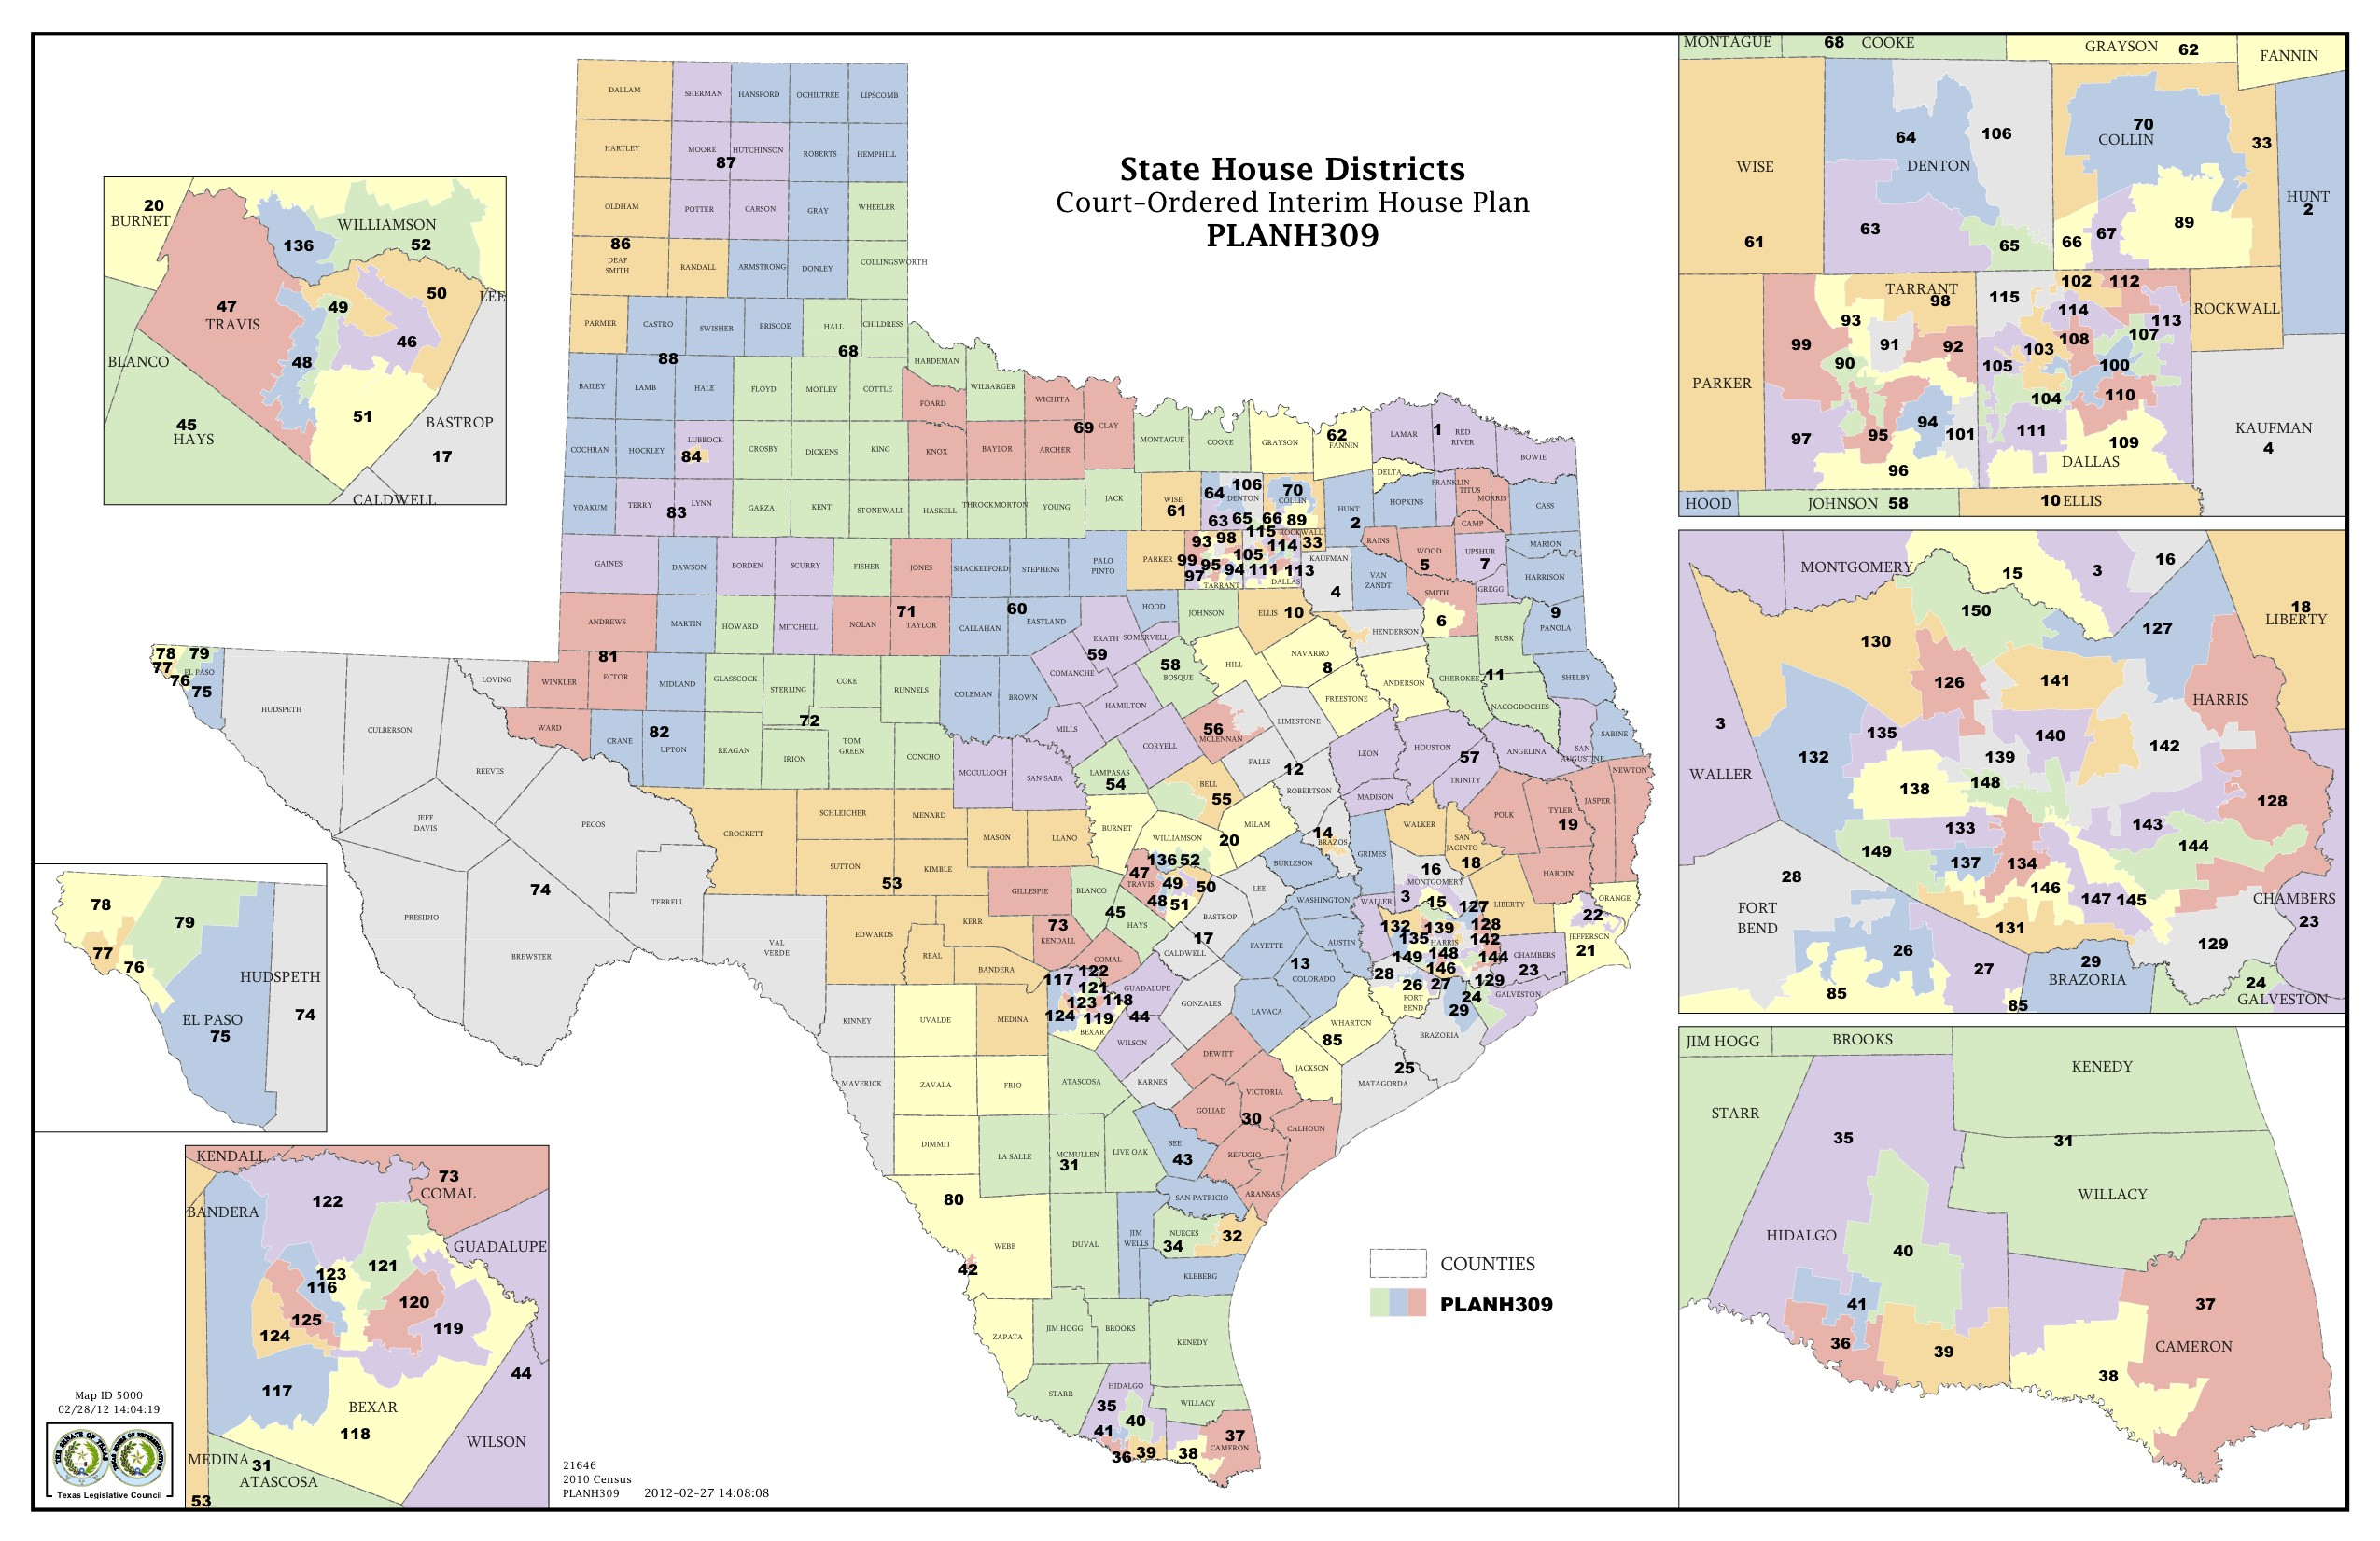 Texas Us Senate District Map New State Senate Awesome Map Texas - Texas Us Representative District Map